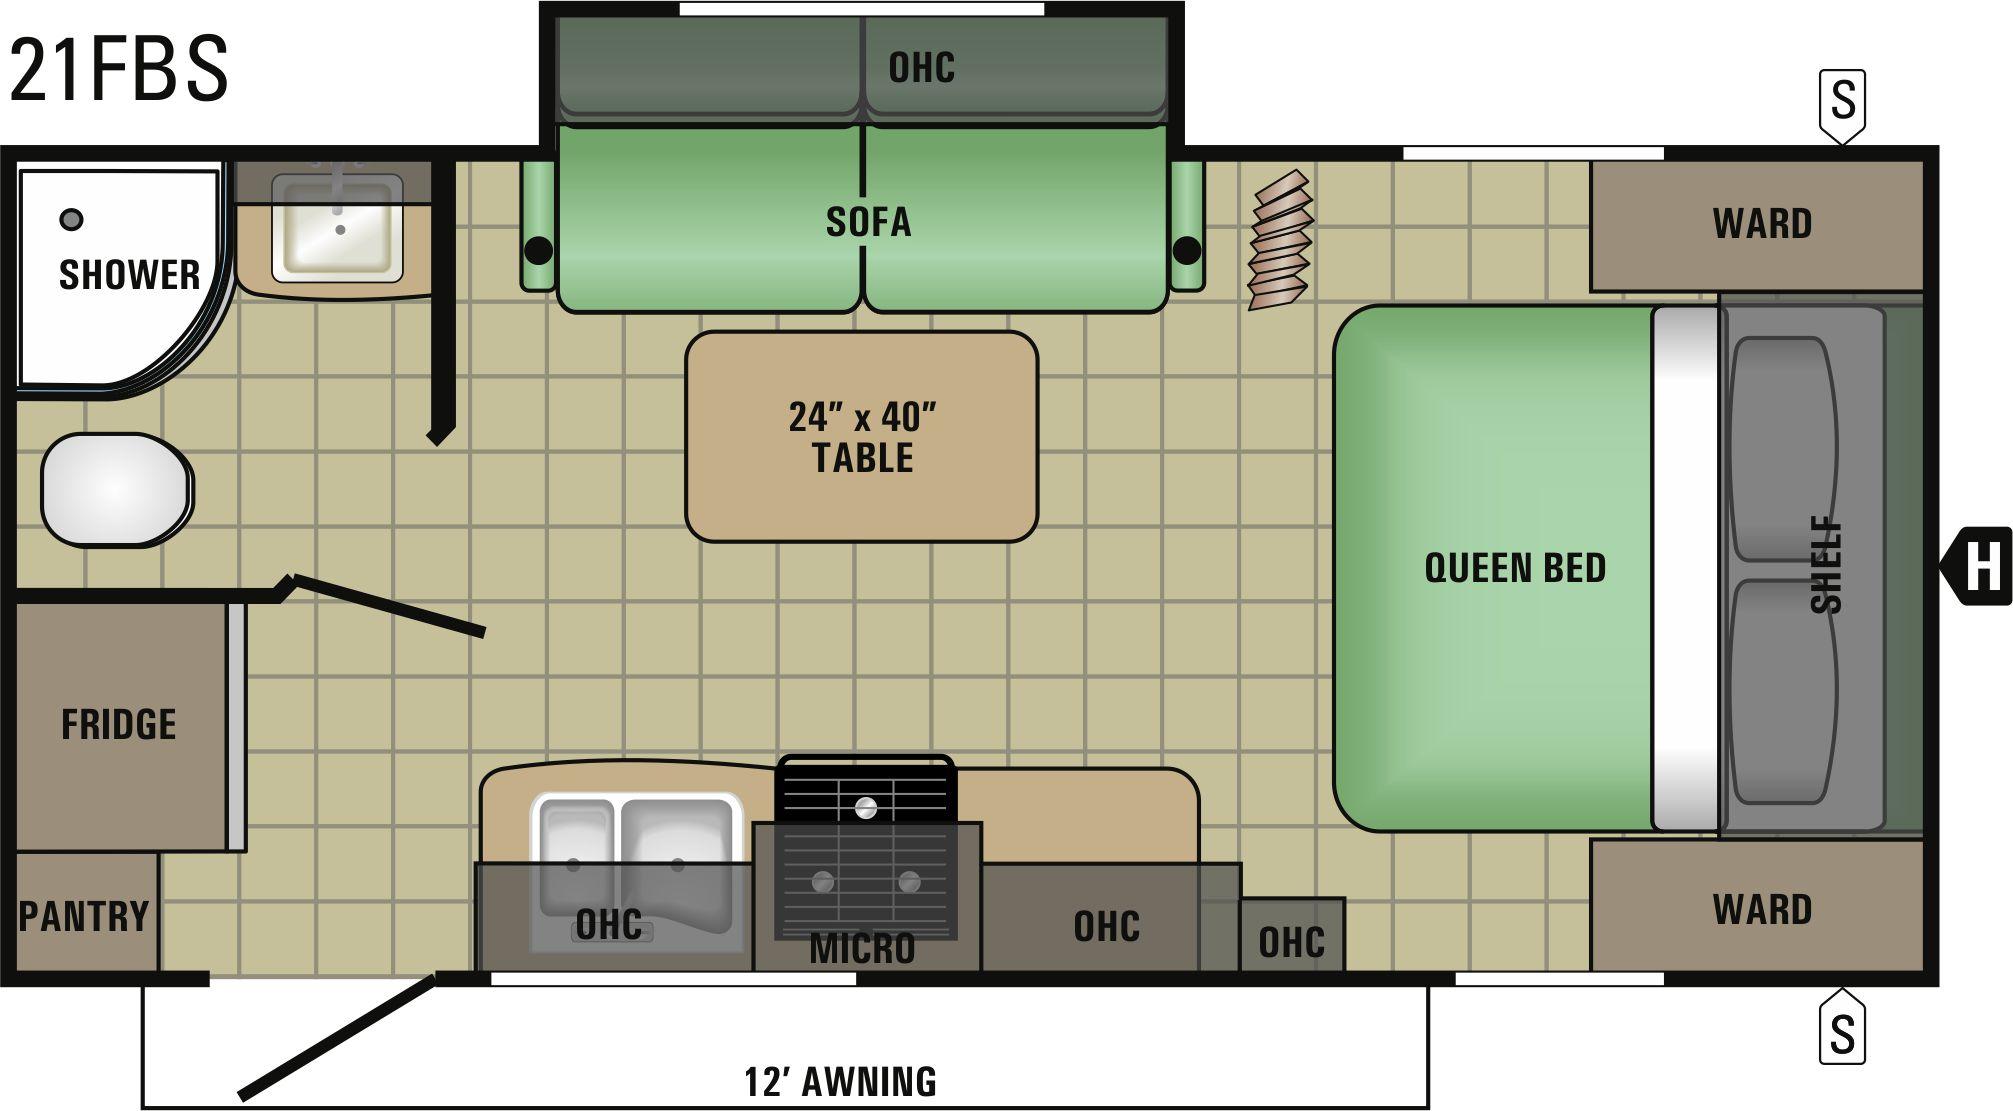 21FBS Floorplan